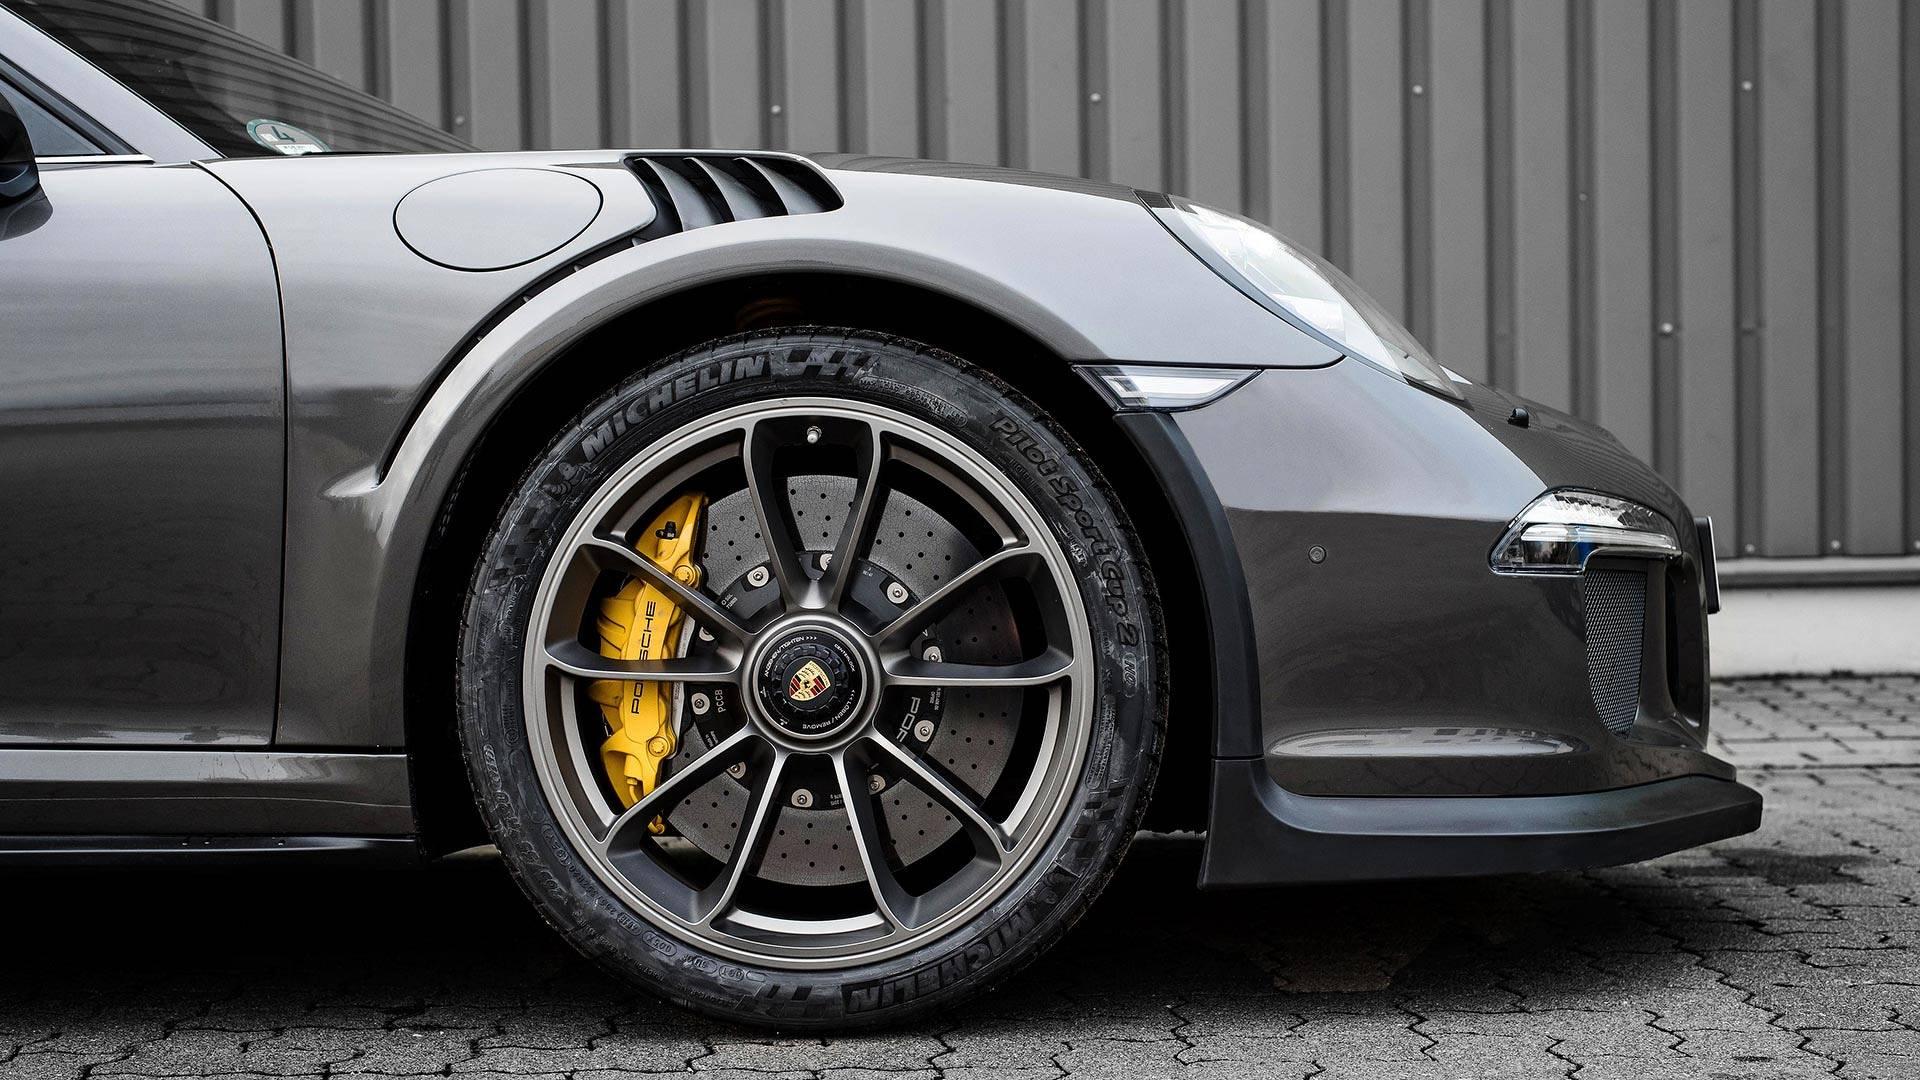 Porsche_911_Targa_GT3_by_Mcchip-dkr_0003